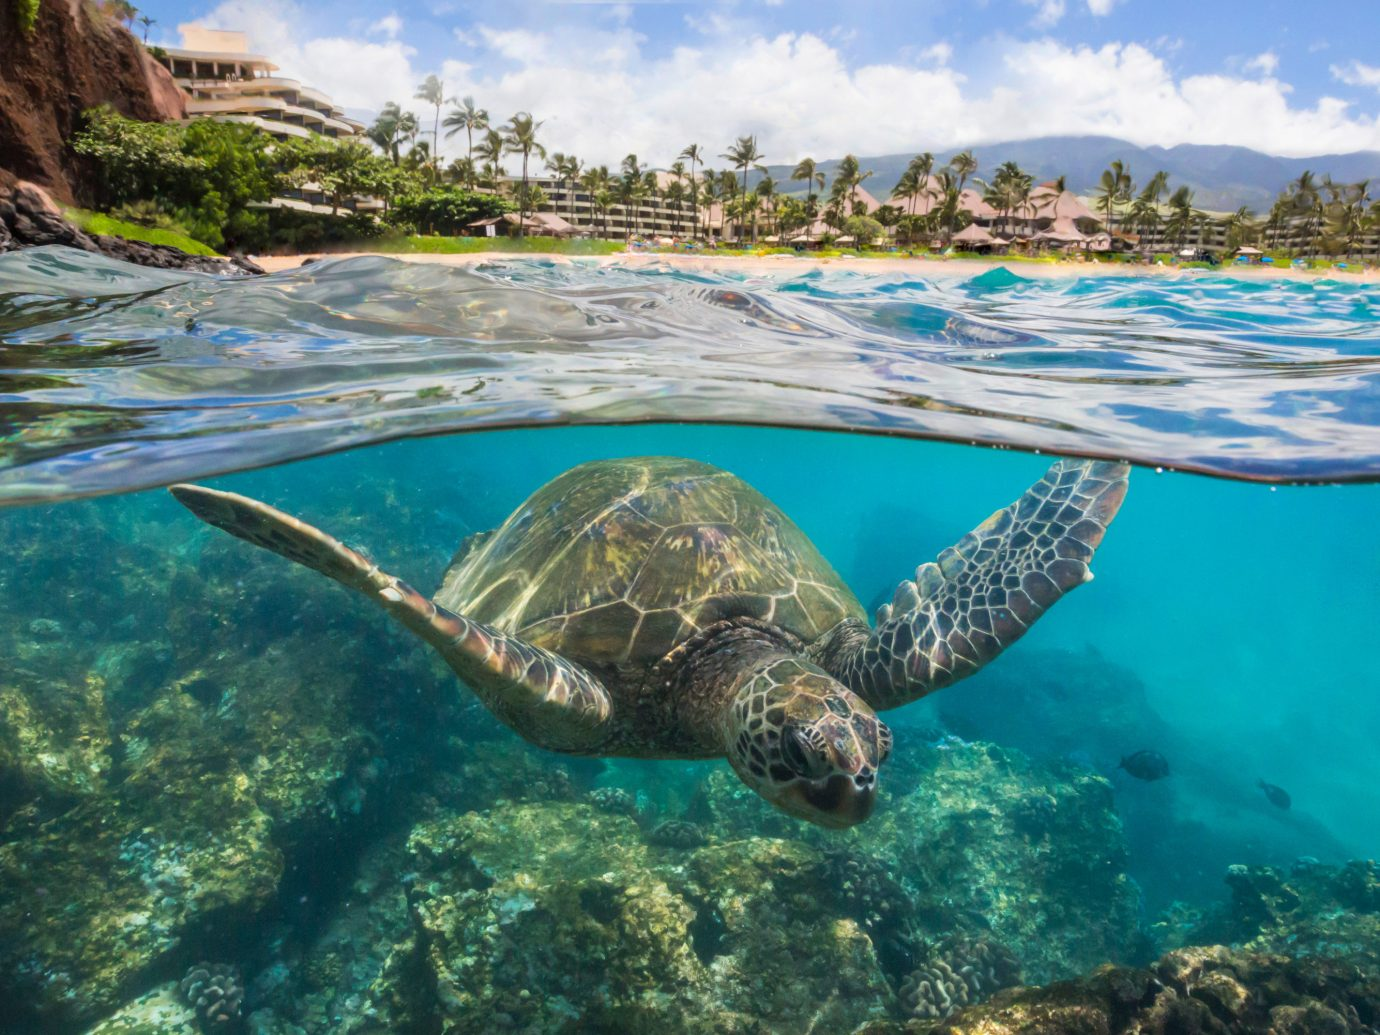 Jetsetter Guides water sky outdoor turtle sea turtle reptile marine biology fauna Sea biology Ocean Pool loggerhead coral reef tropics swimming